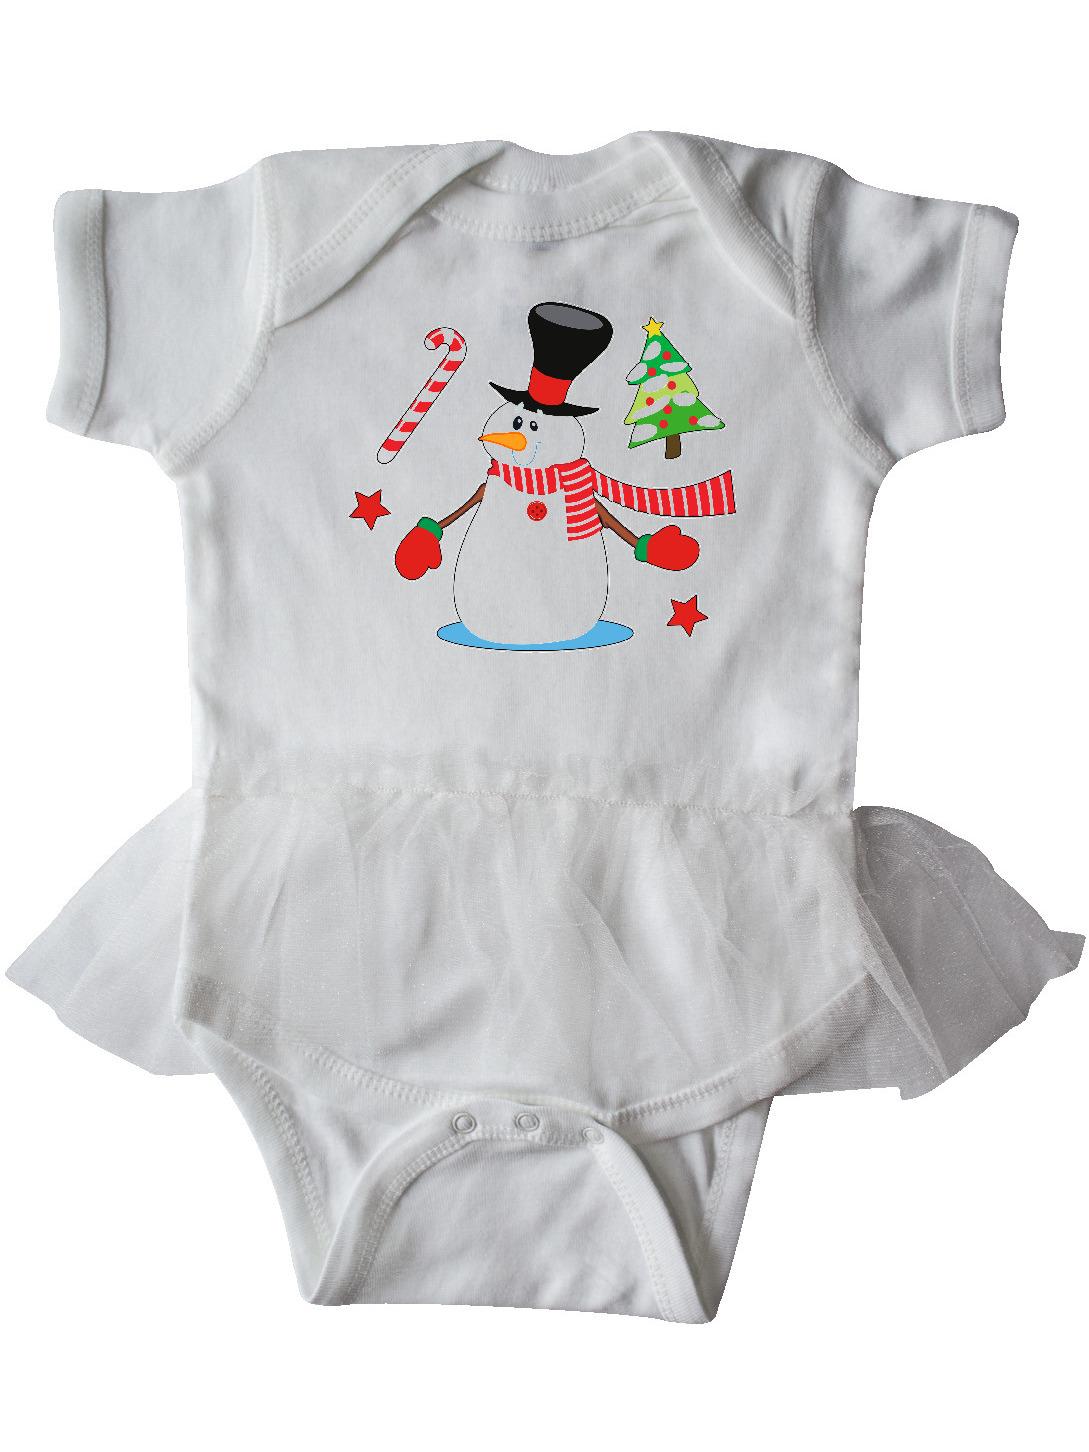 Cat In The Hat Infant Clothes : infant, clothes, Santa, Infant, Bodysuit, Inktastic, Christmas, Girls